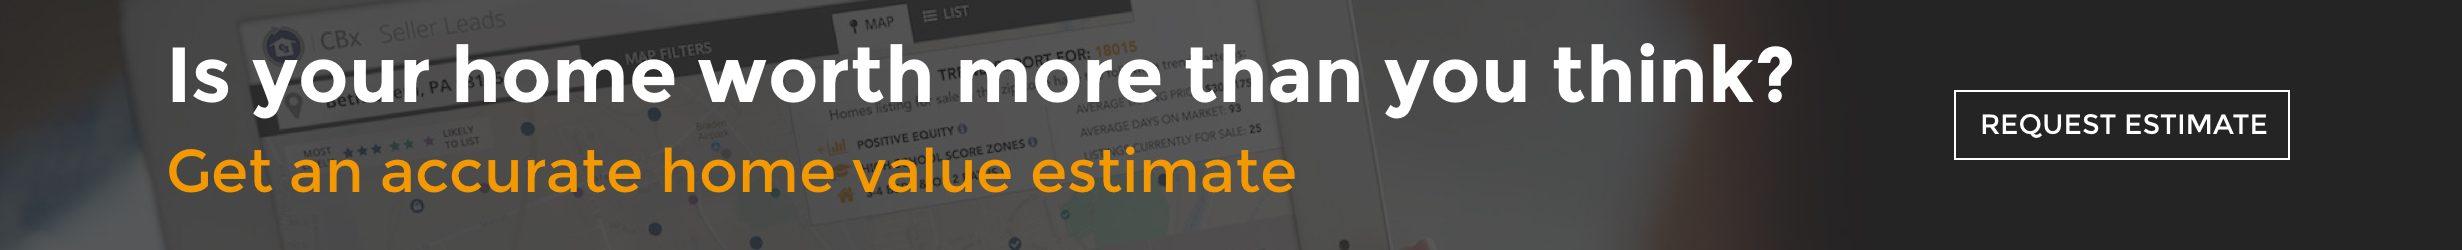 Get a home estimate